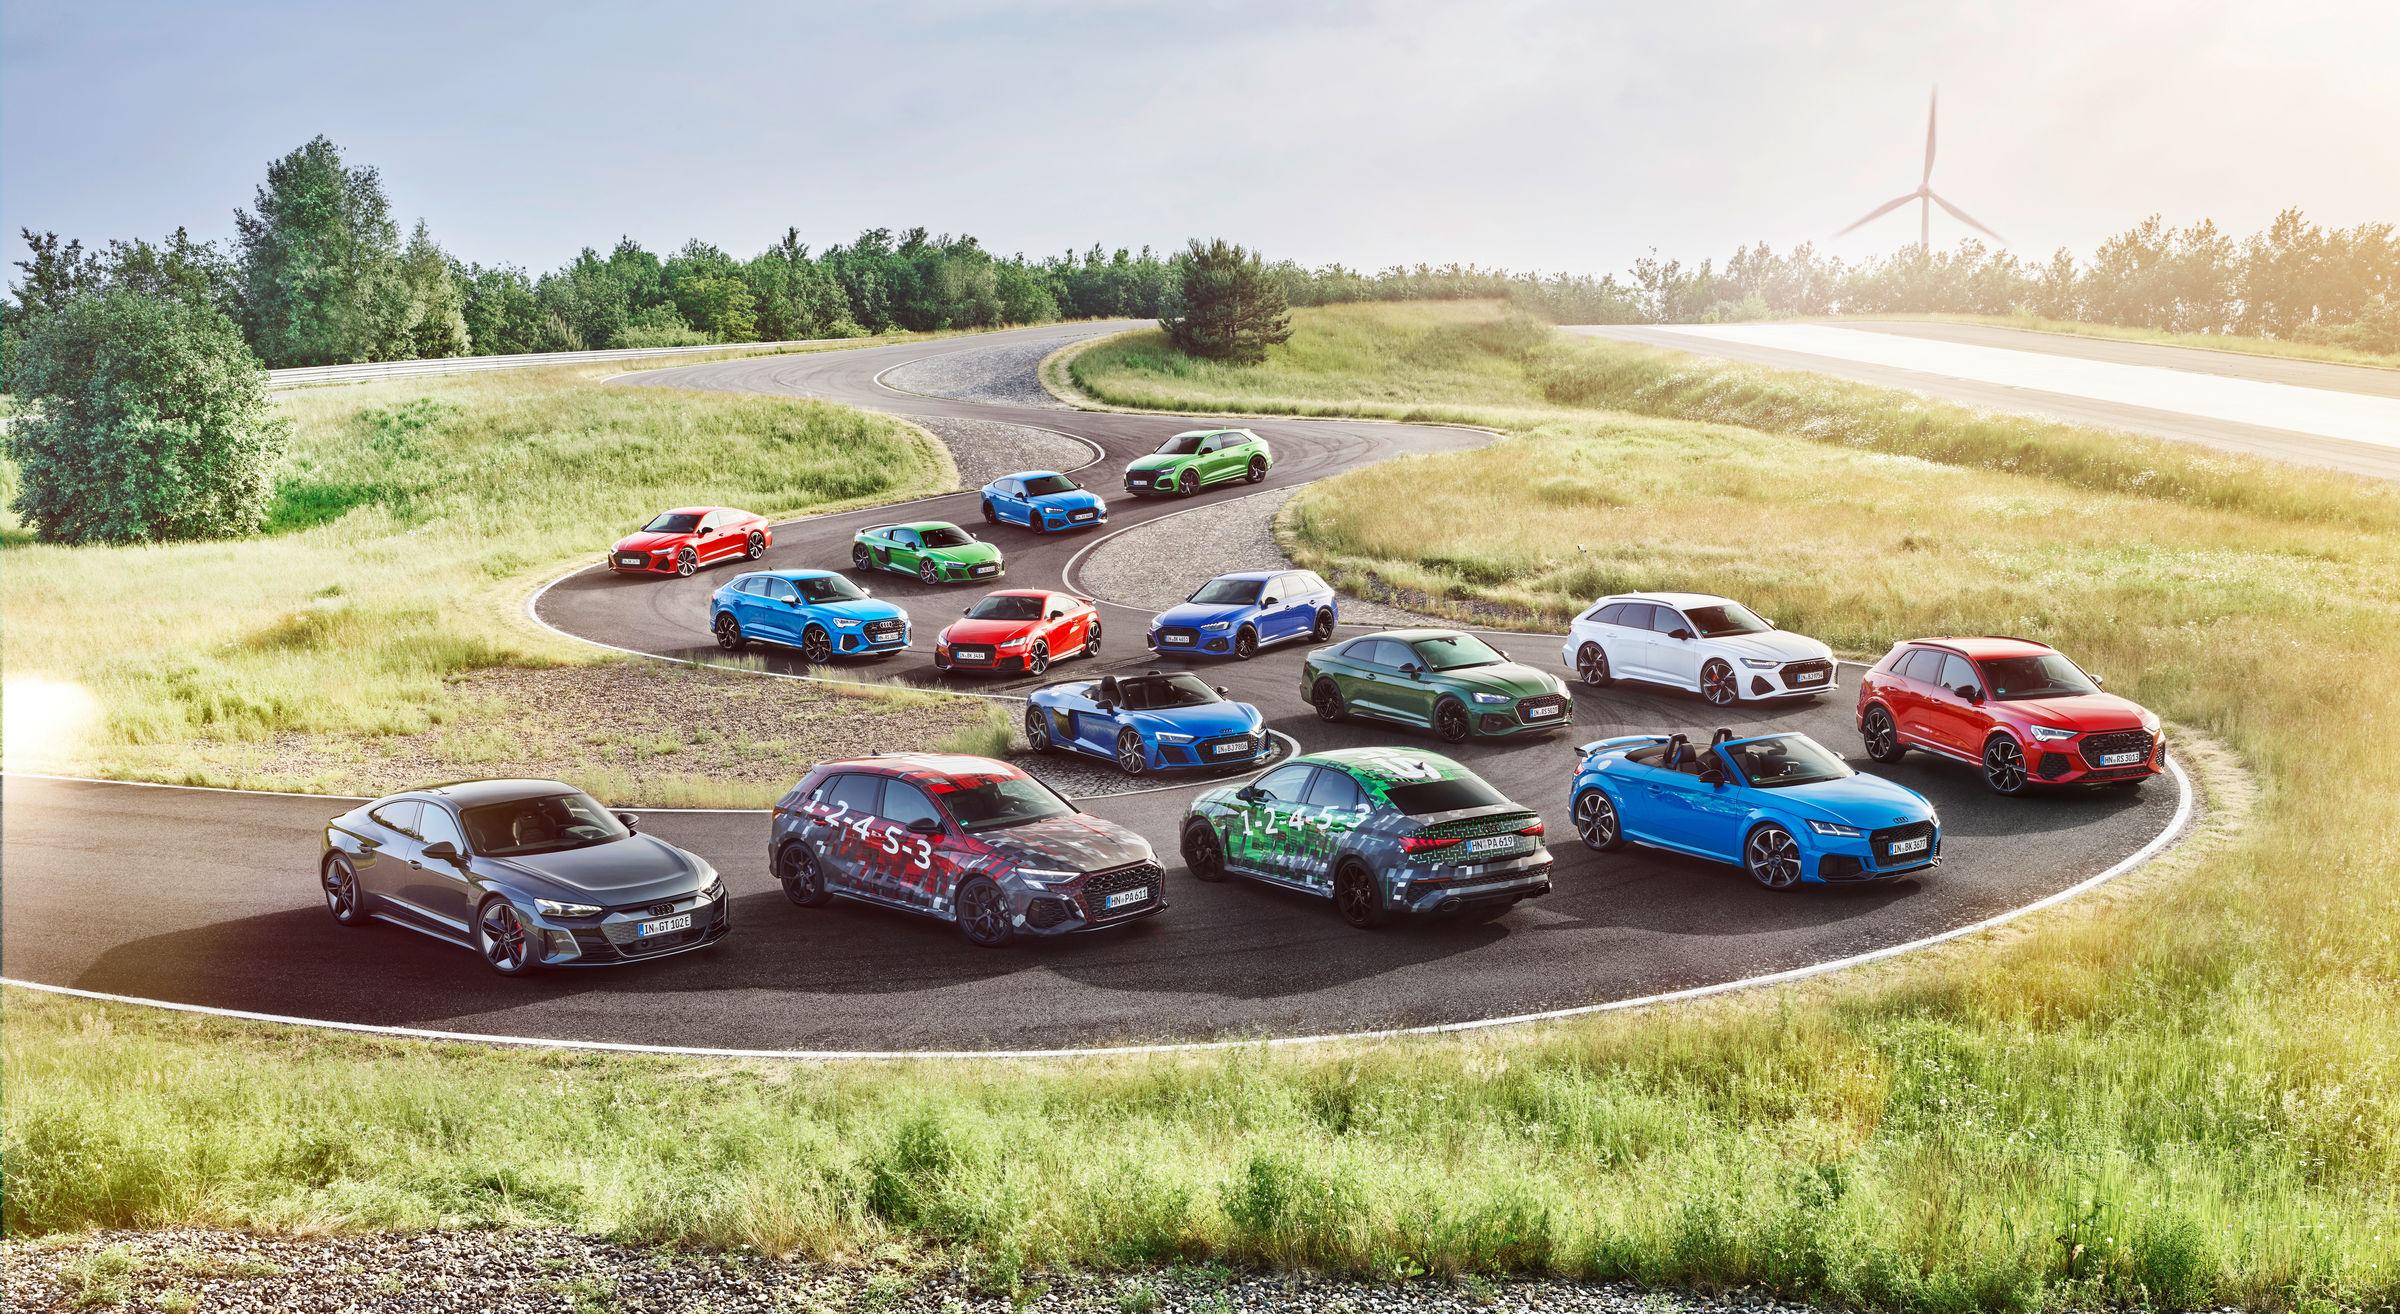 Nuova Audi RS 3 in arrivo: prime immagini.